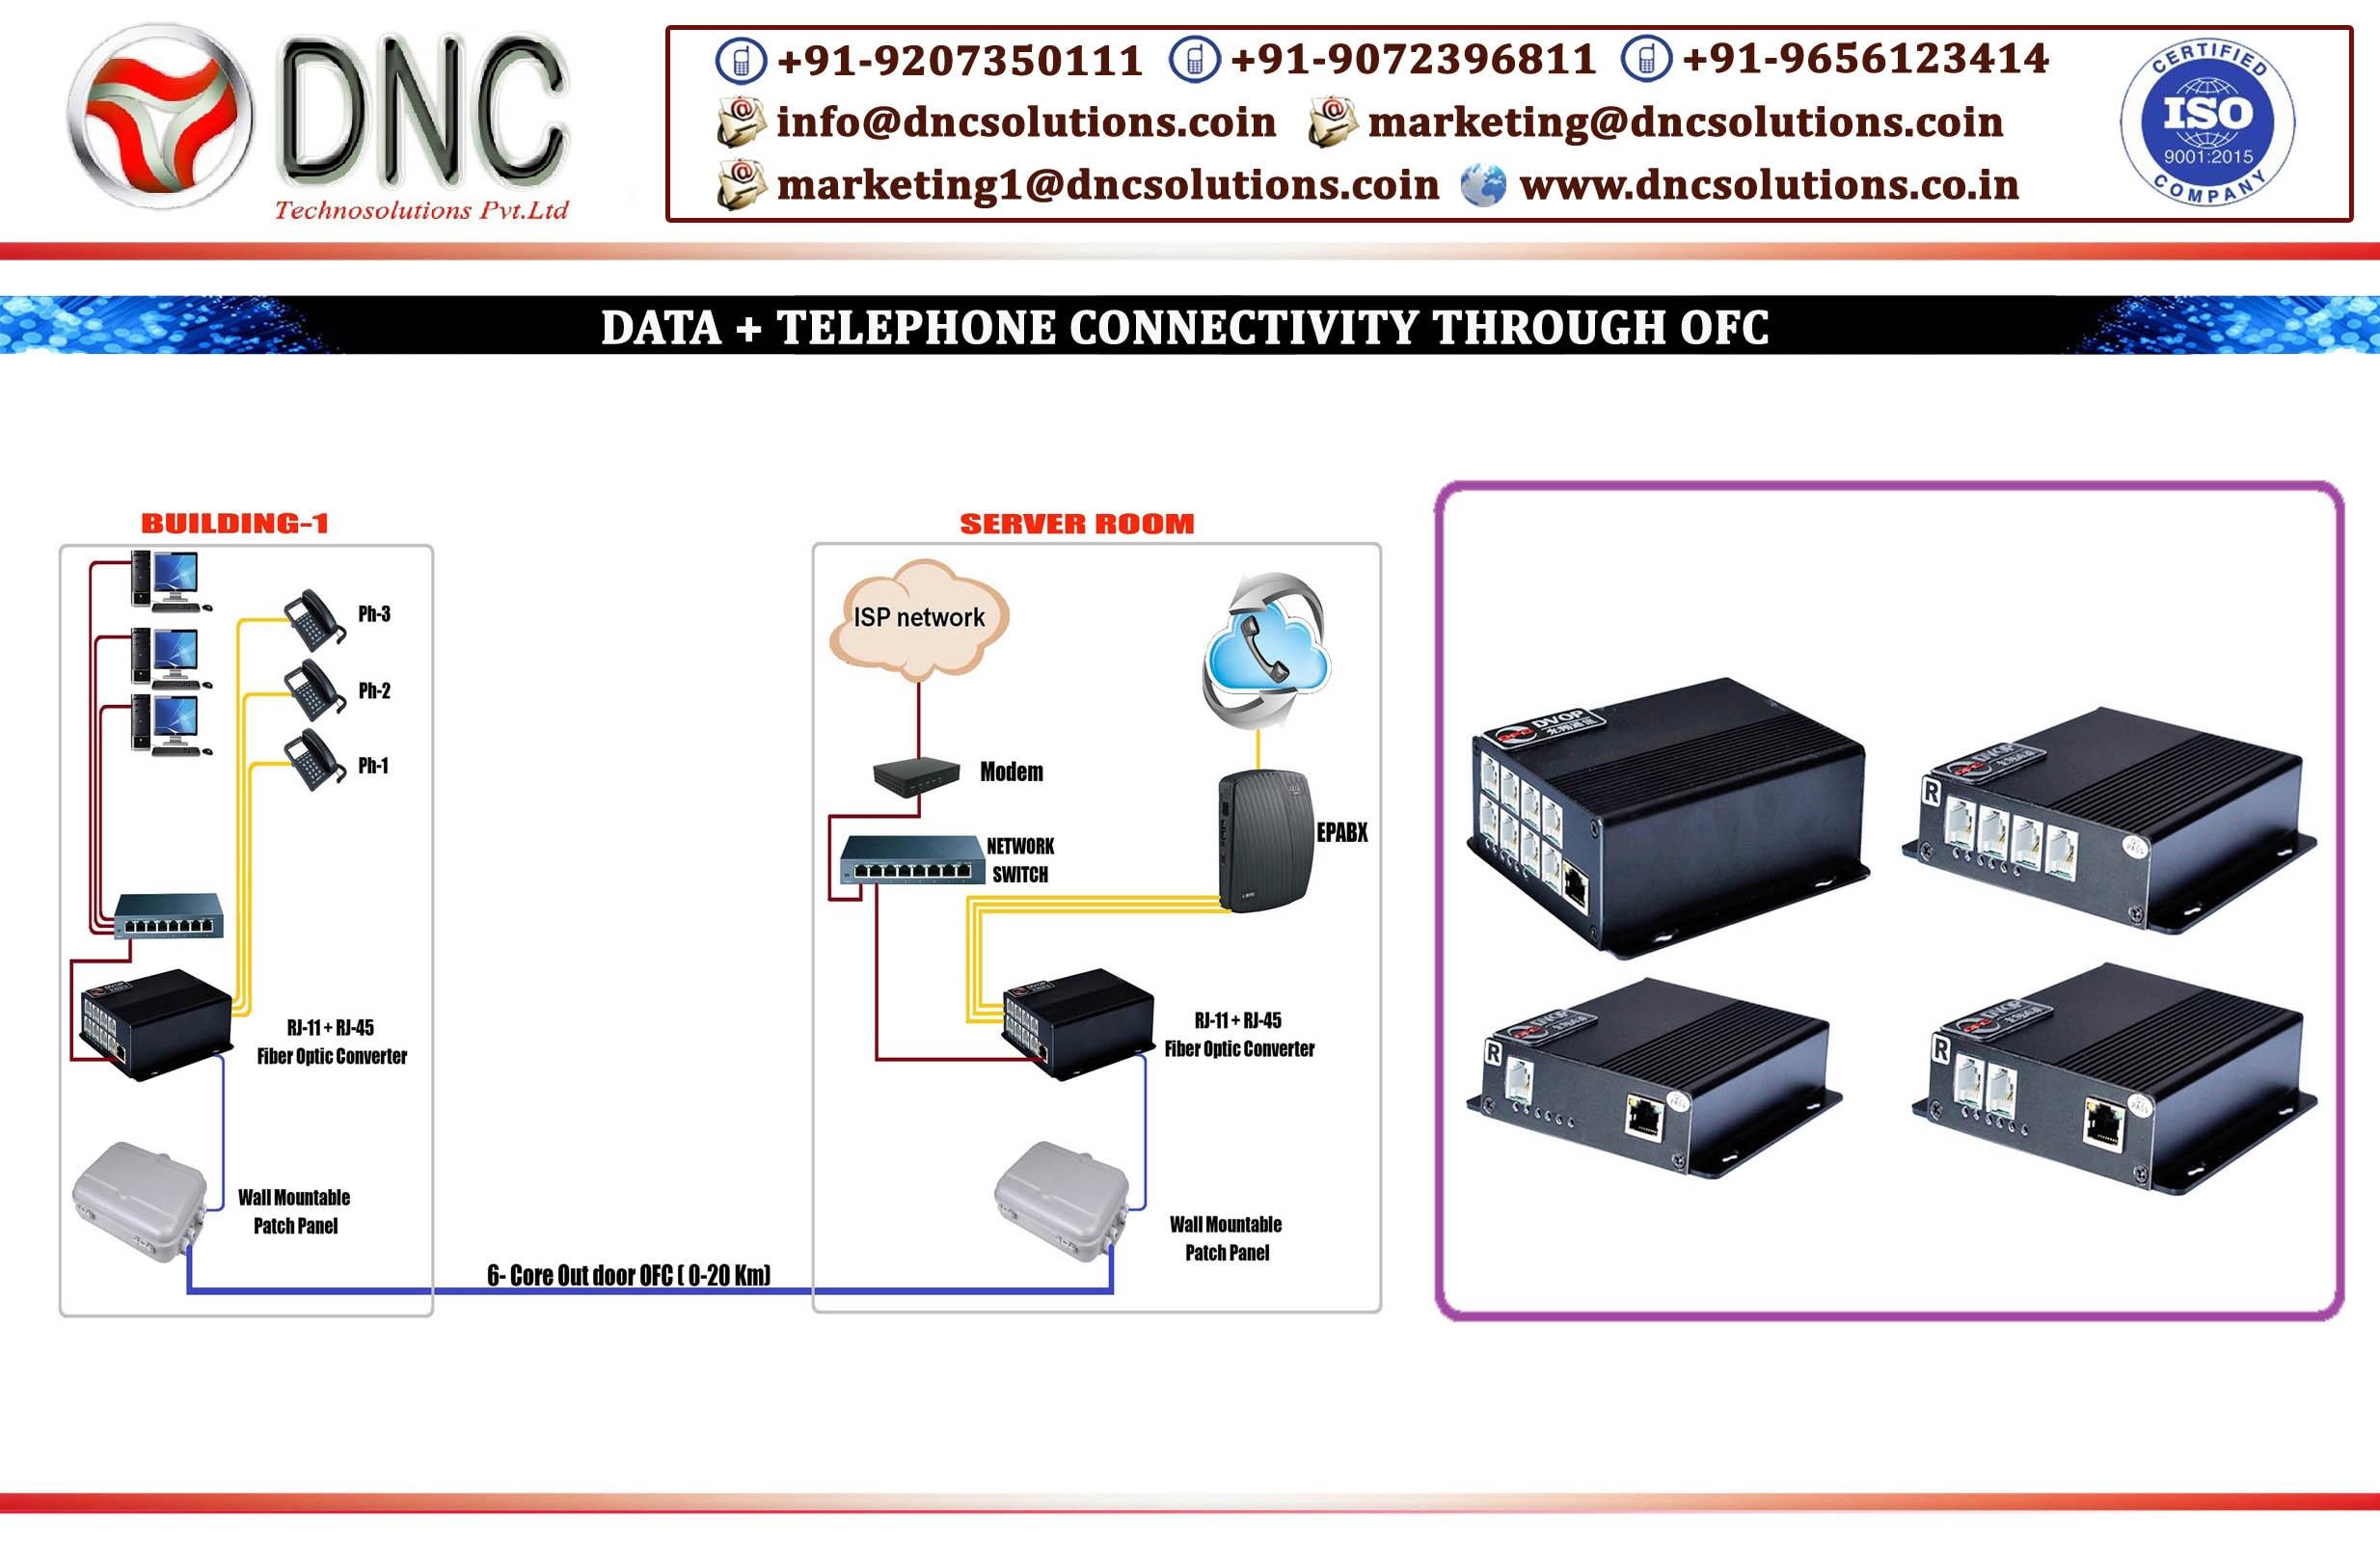 Updates | DNC TECHNOSOLUTIONS PVT LTD in Kochi,DNC is a premiere